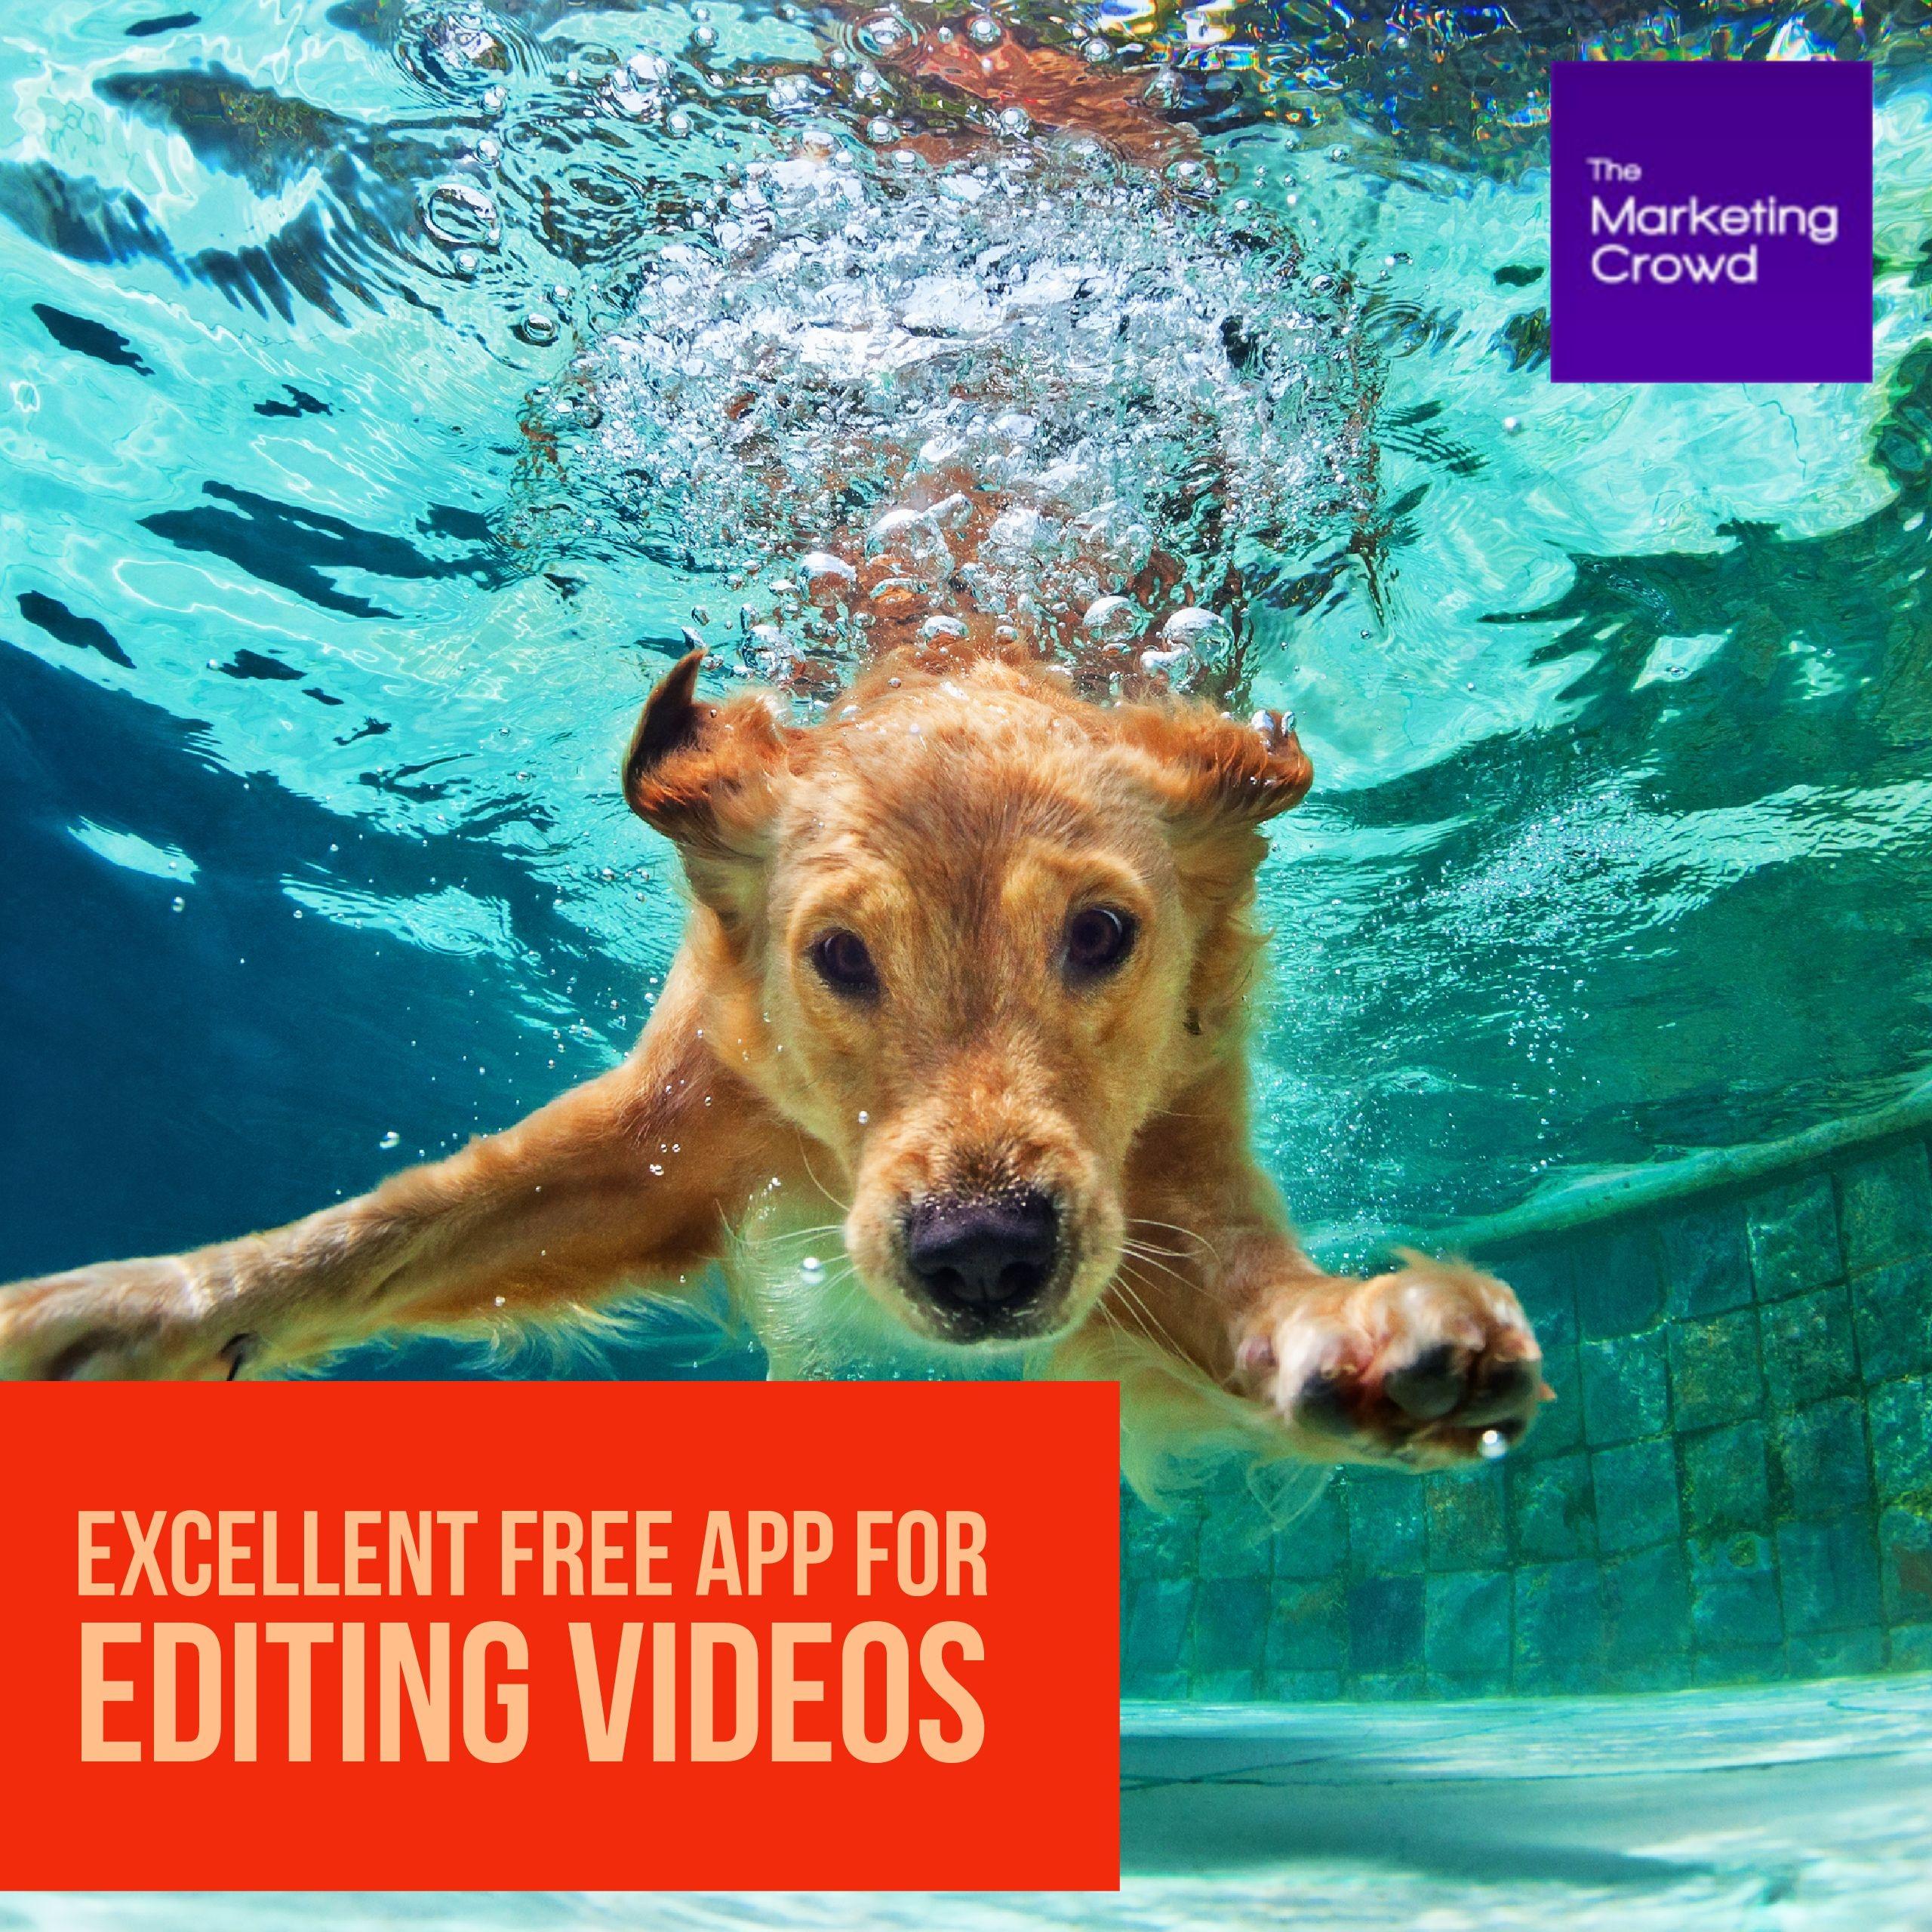 Vlogit video editing app